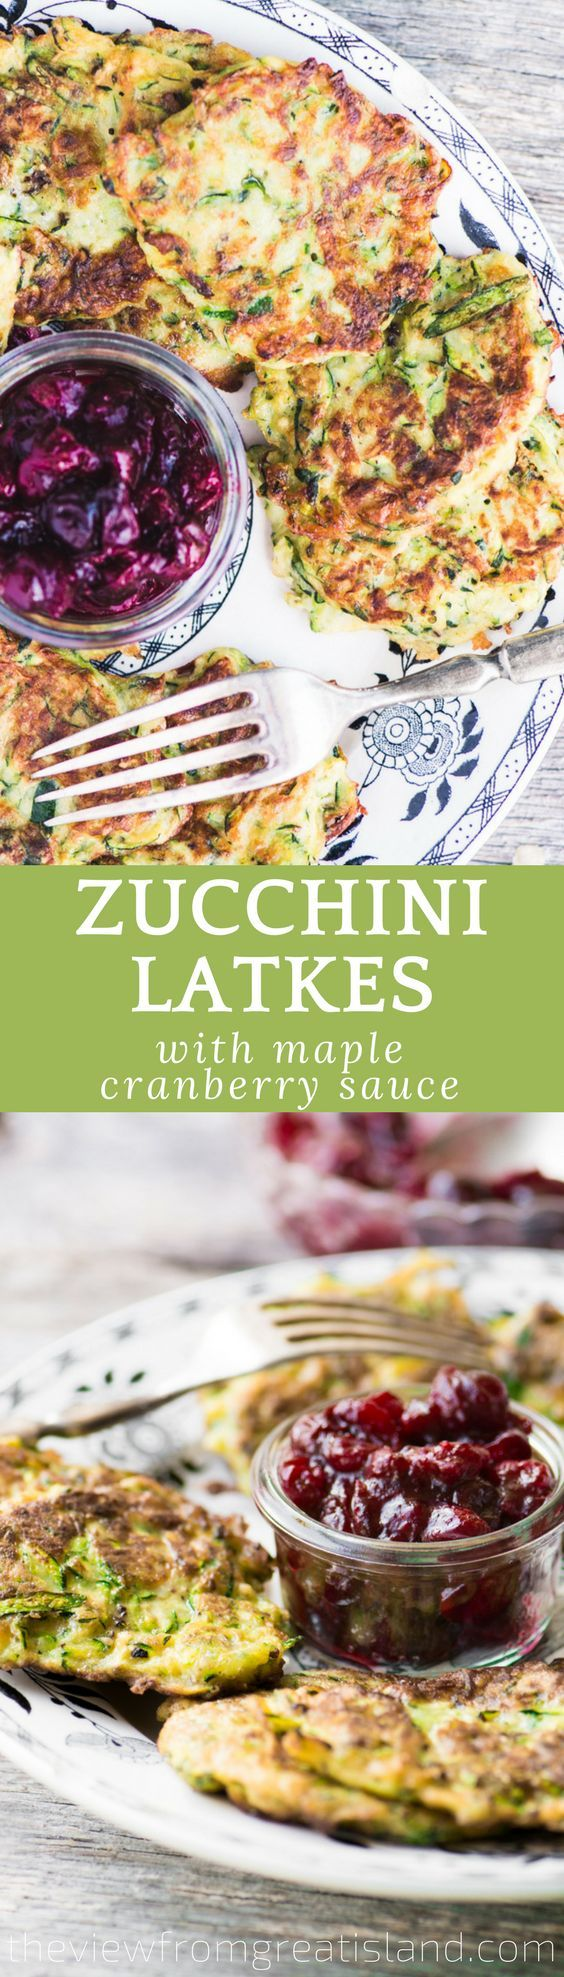 Zucchini Latkes with Maple Cranberry Sauce is a colorful twist on a beloved holiday tradition! #hannukah #passover #potatopancakes #latkes #zucchini #breakfast #jewishrecipe #latkerecipe